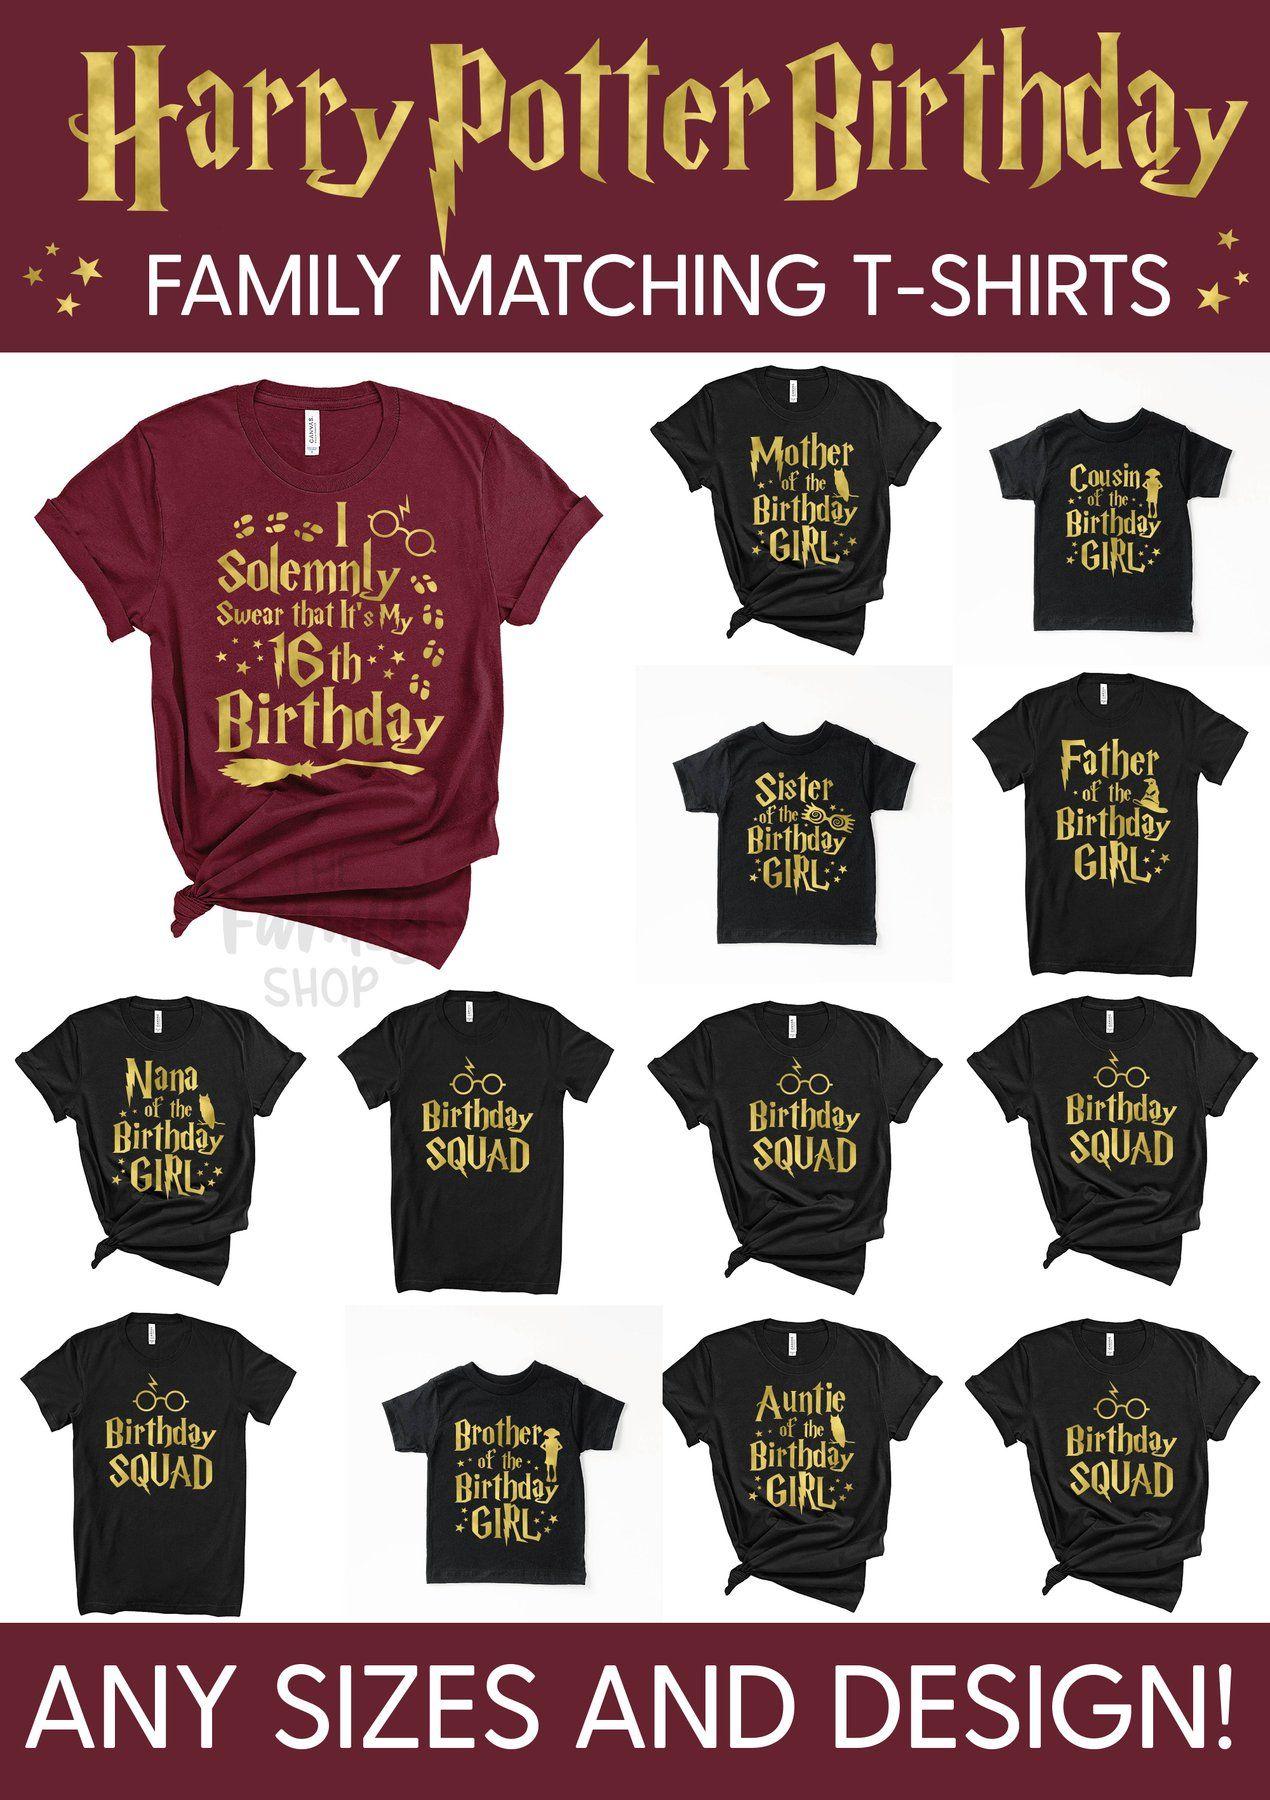 Park Art My WordPress Blog_Harry Potter Family Birthday Shirts